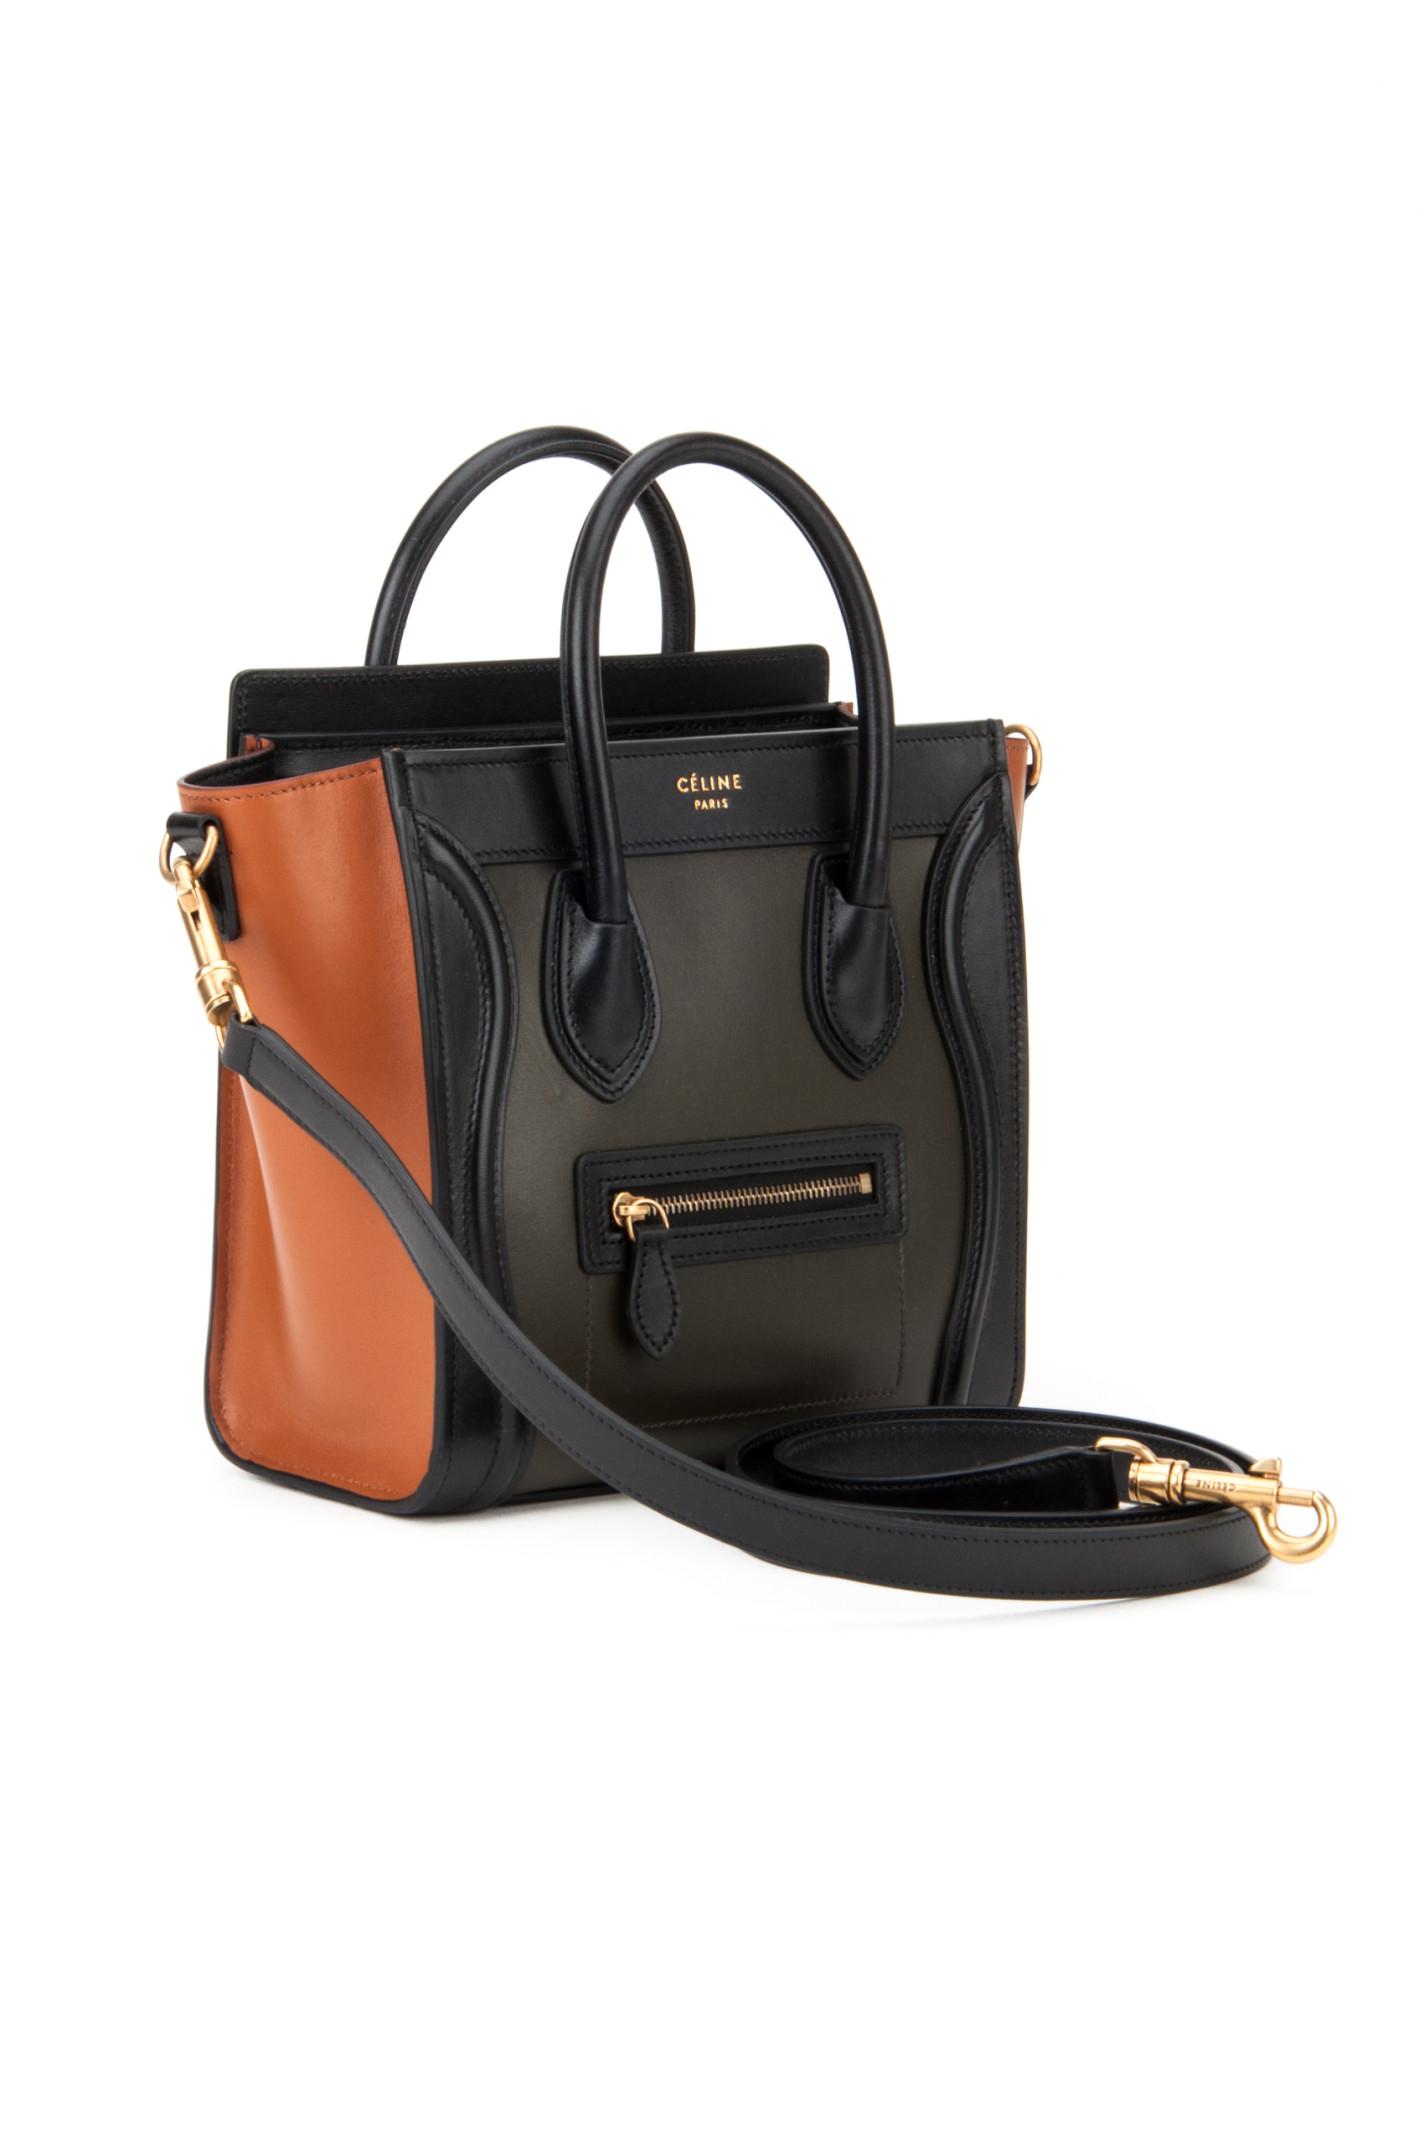 C¨¦line Luggage Nano Bag in Khaki | Lyst